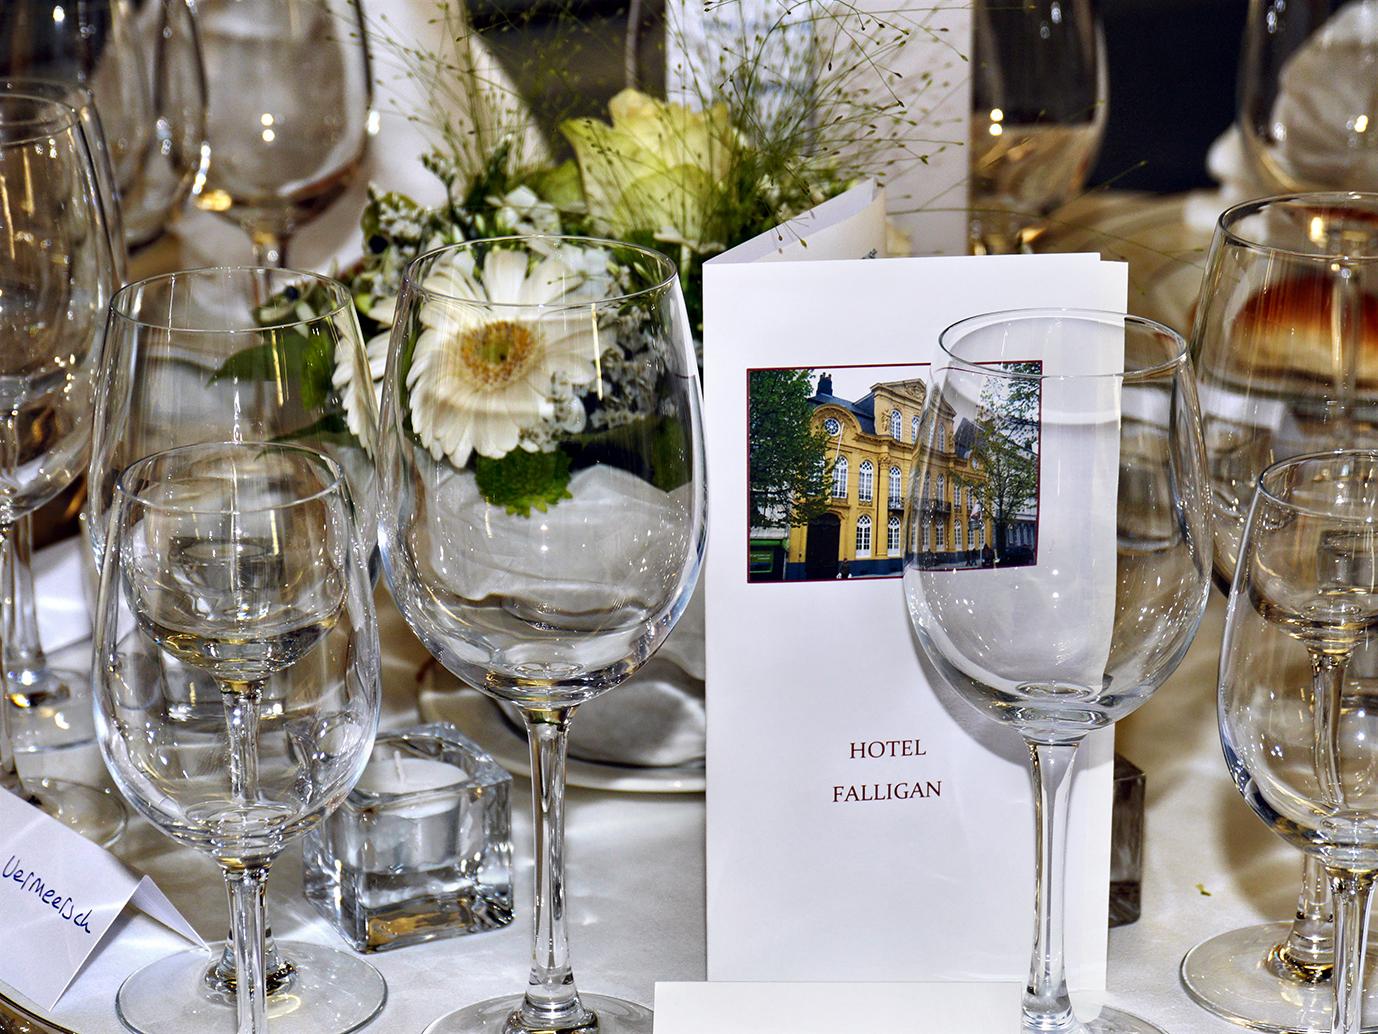 Tafel in Hotel Falligan 13